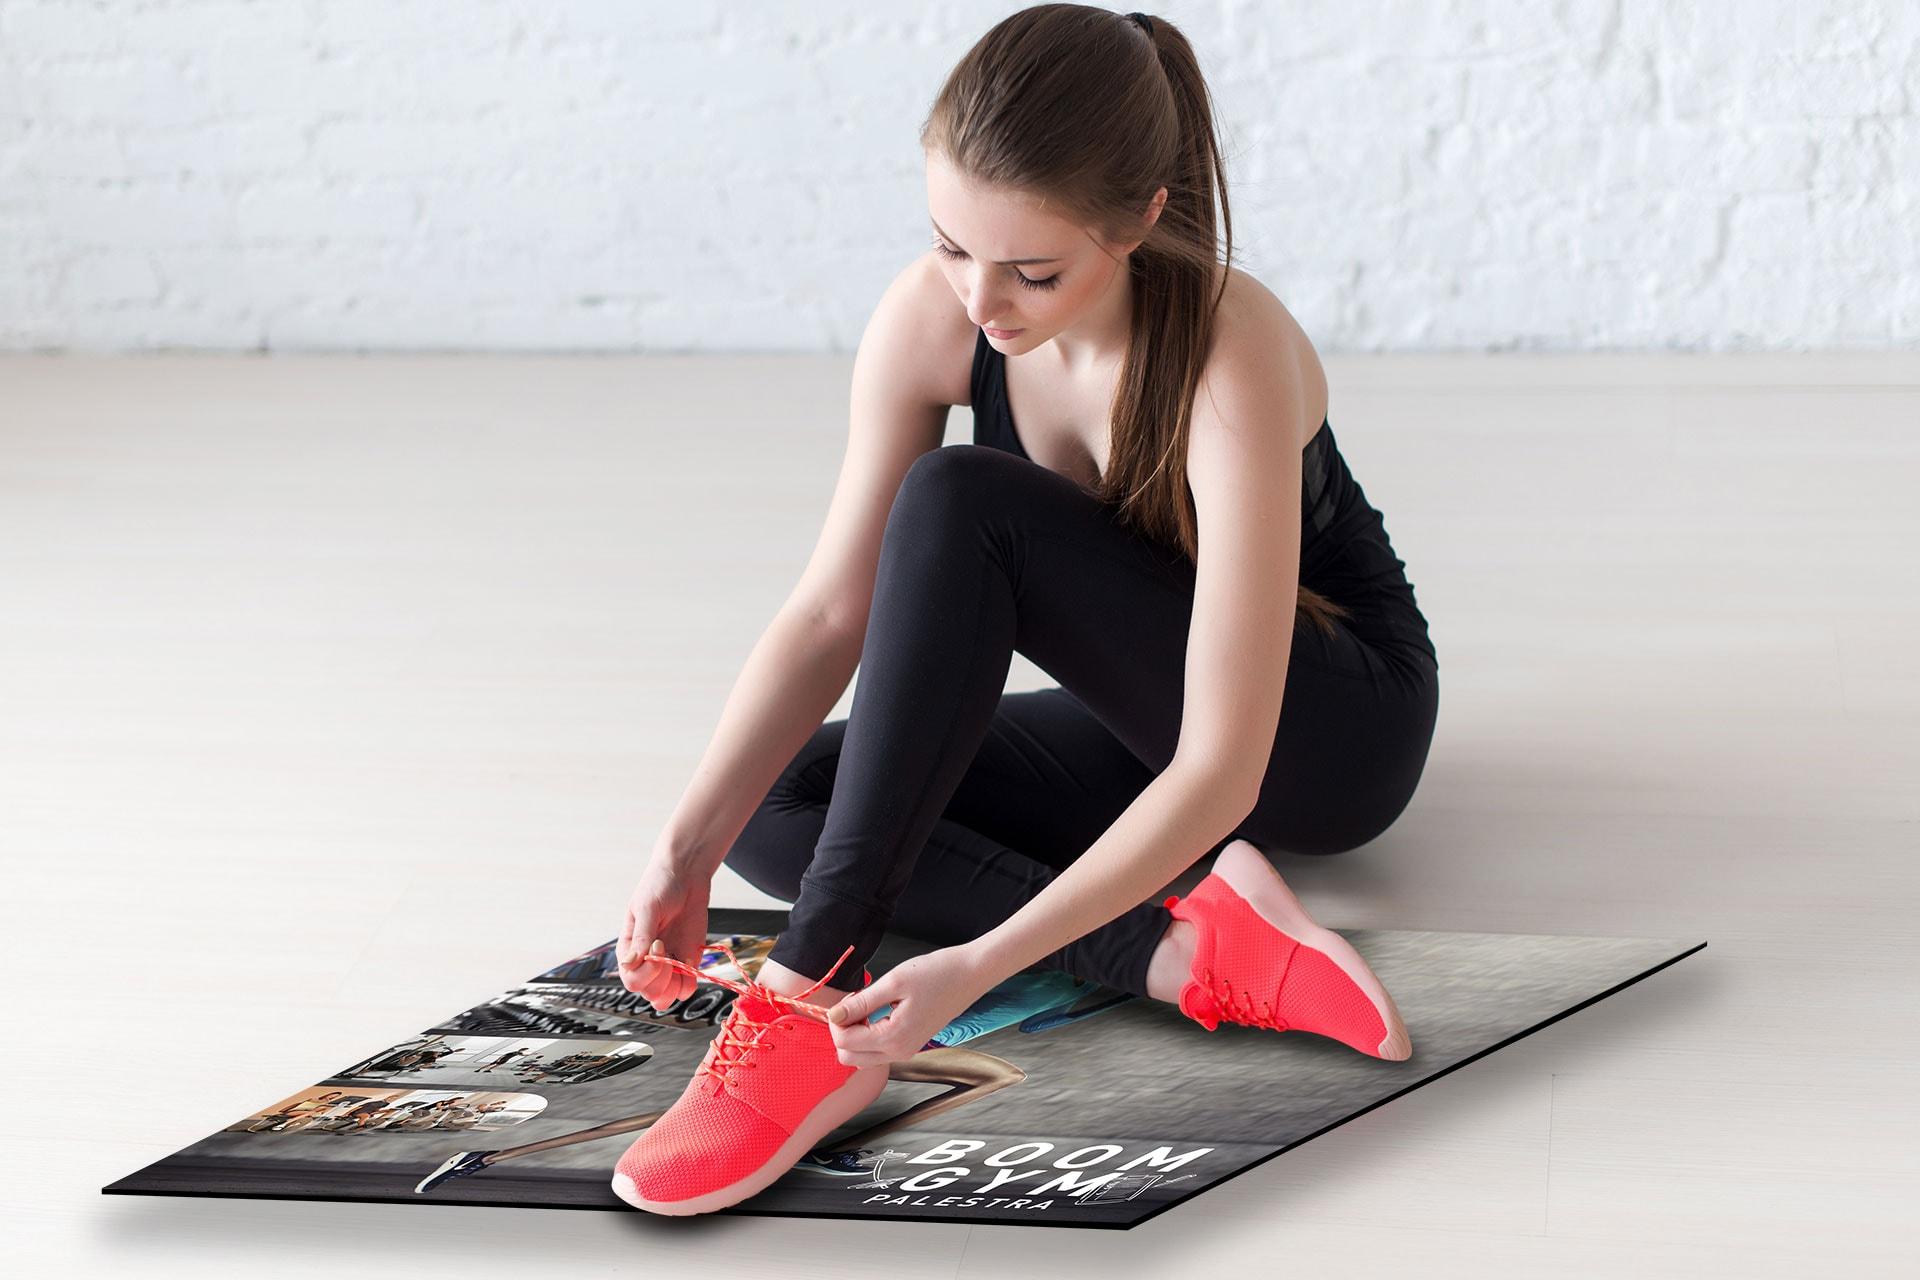 pad su misura - fitness - palestre